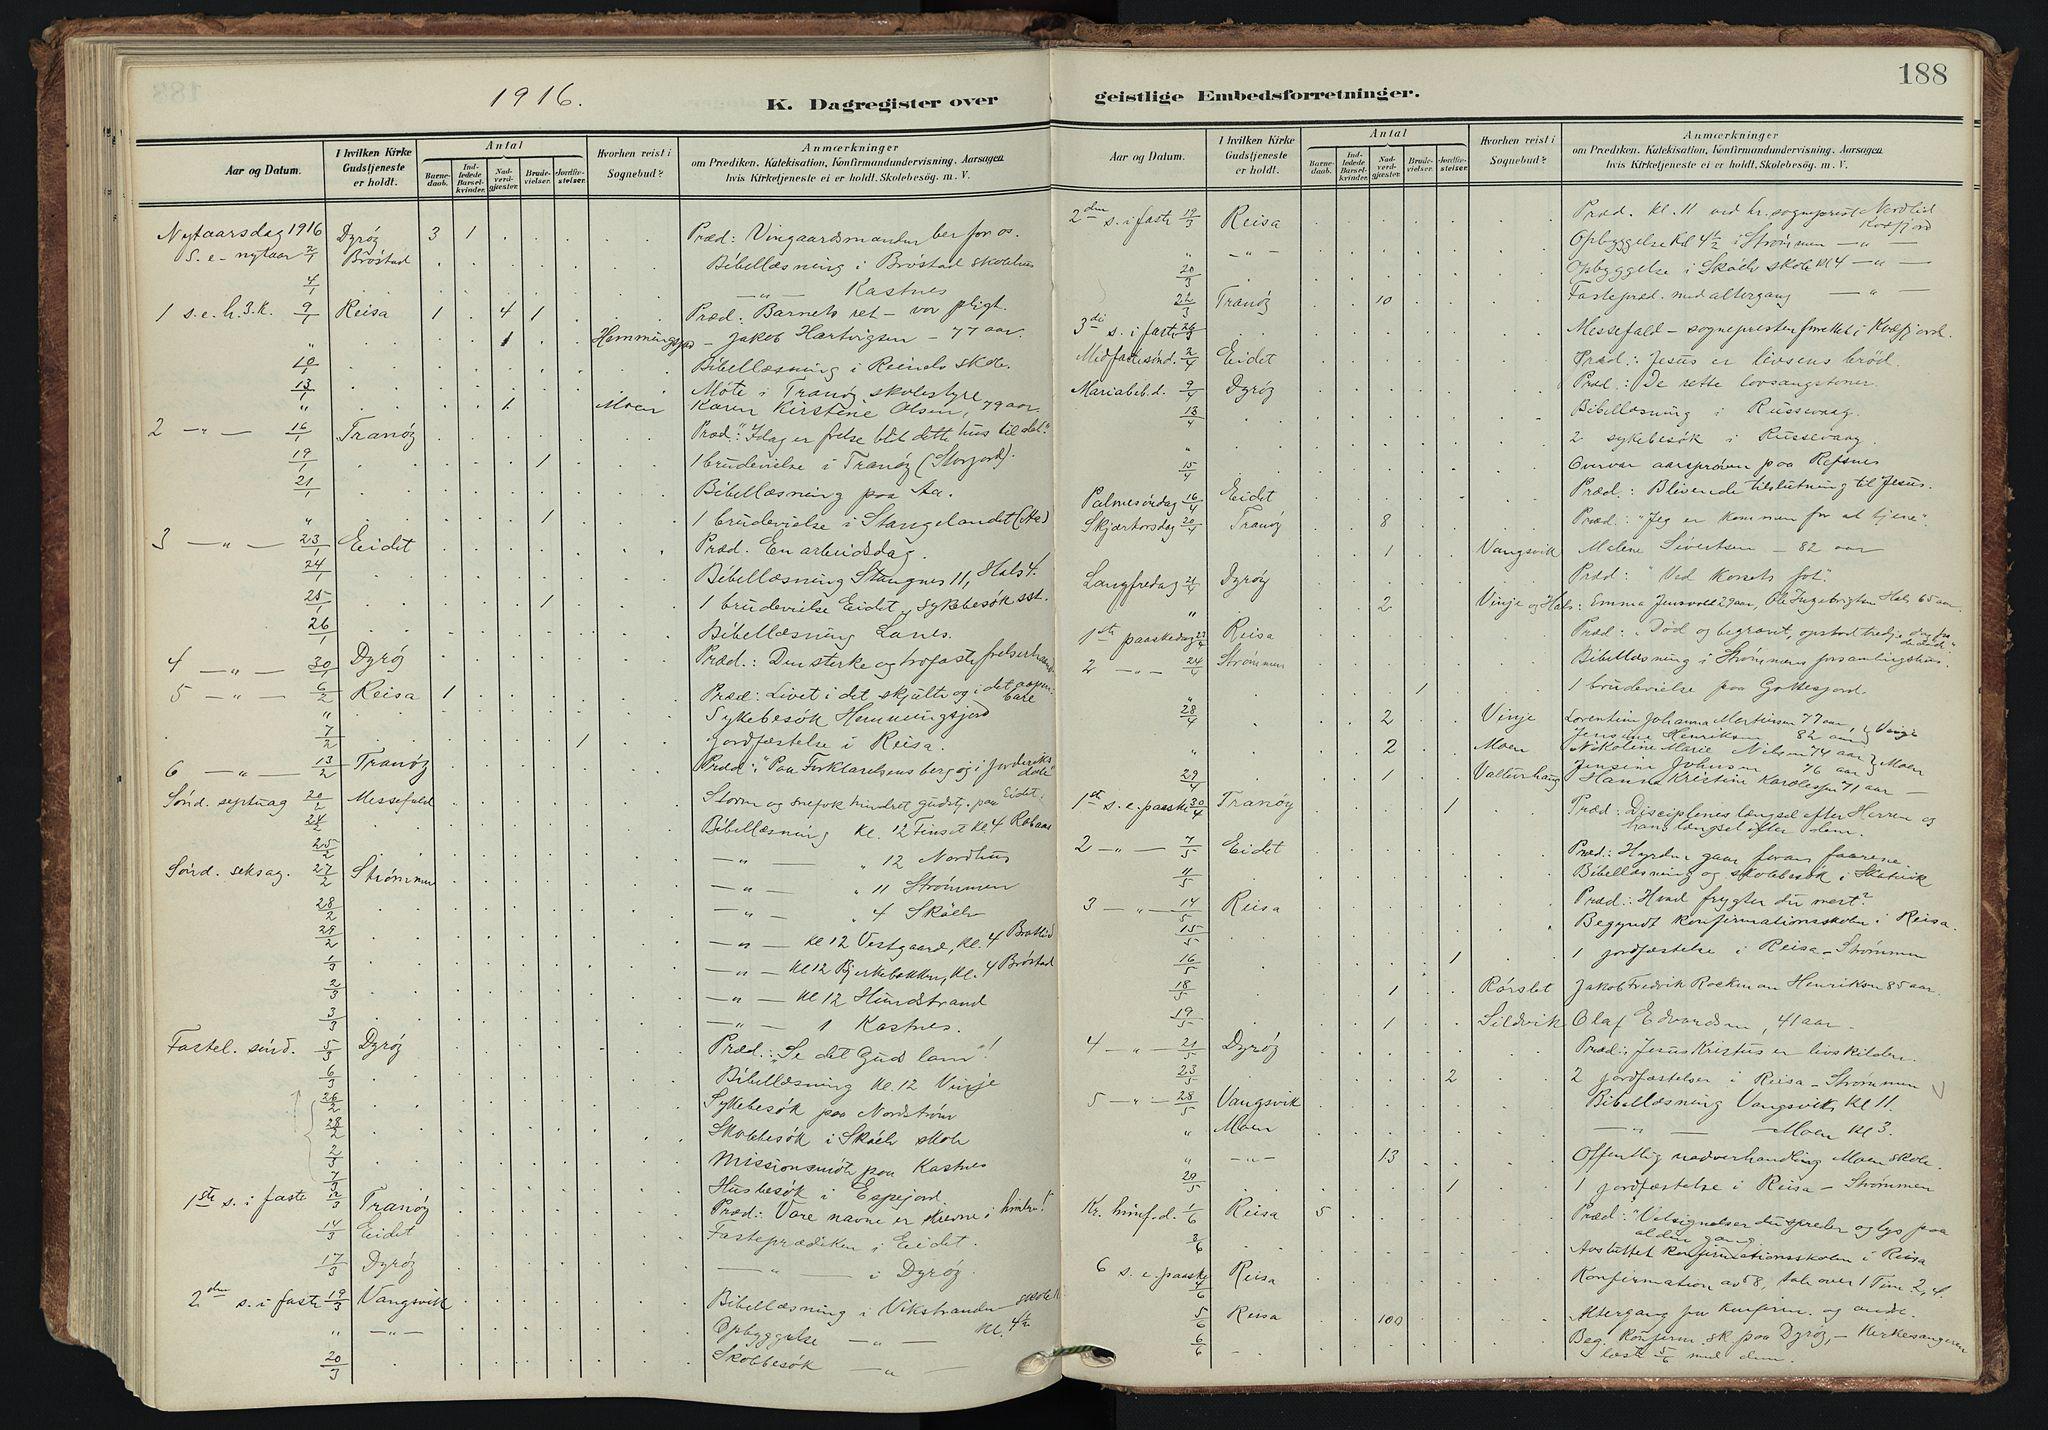 SATØ, Tranøy sokneprestkontor, I/Ia/Iaa/L0014kirke: Ministerialbok nr. 14, 1905-1919, s. 188